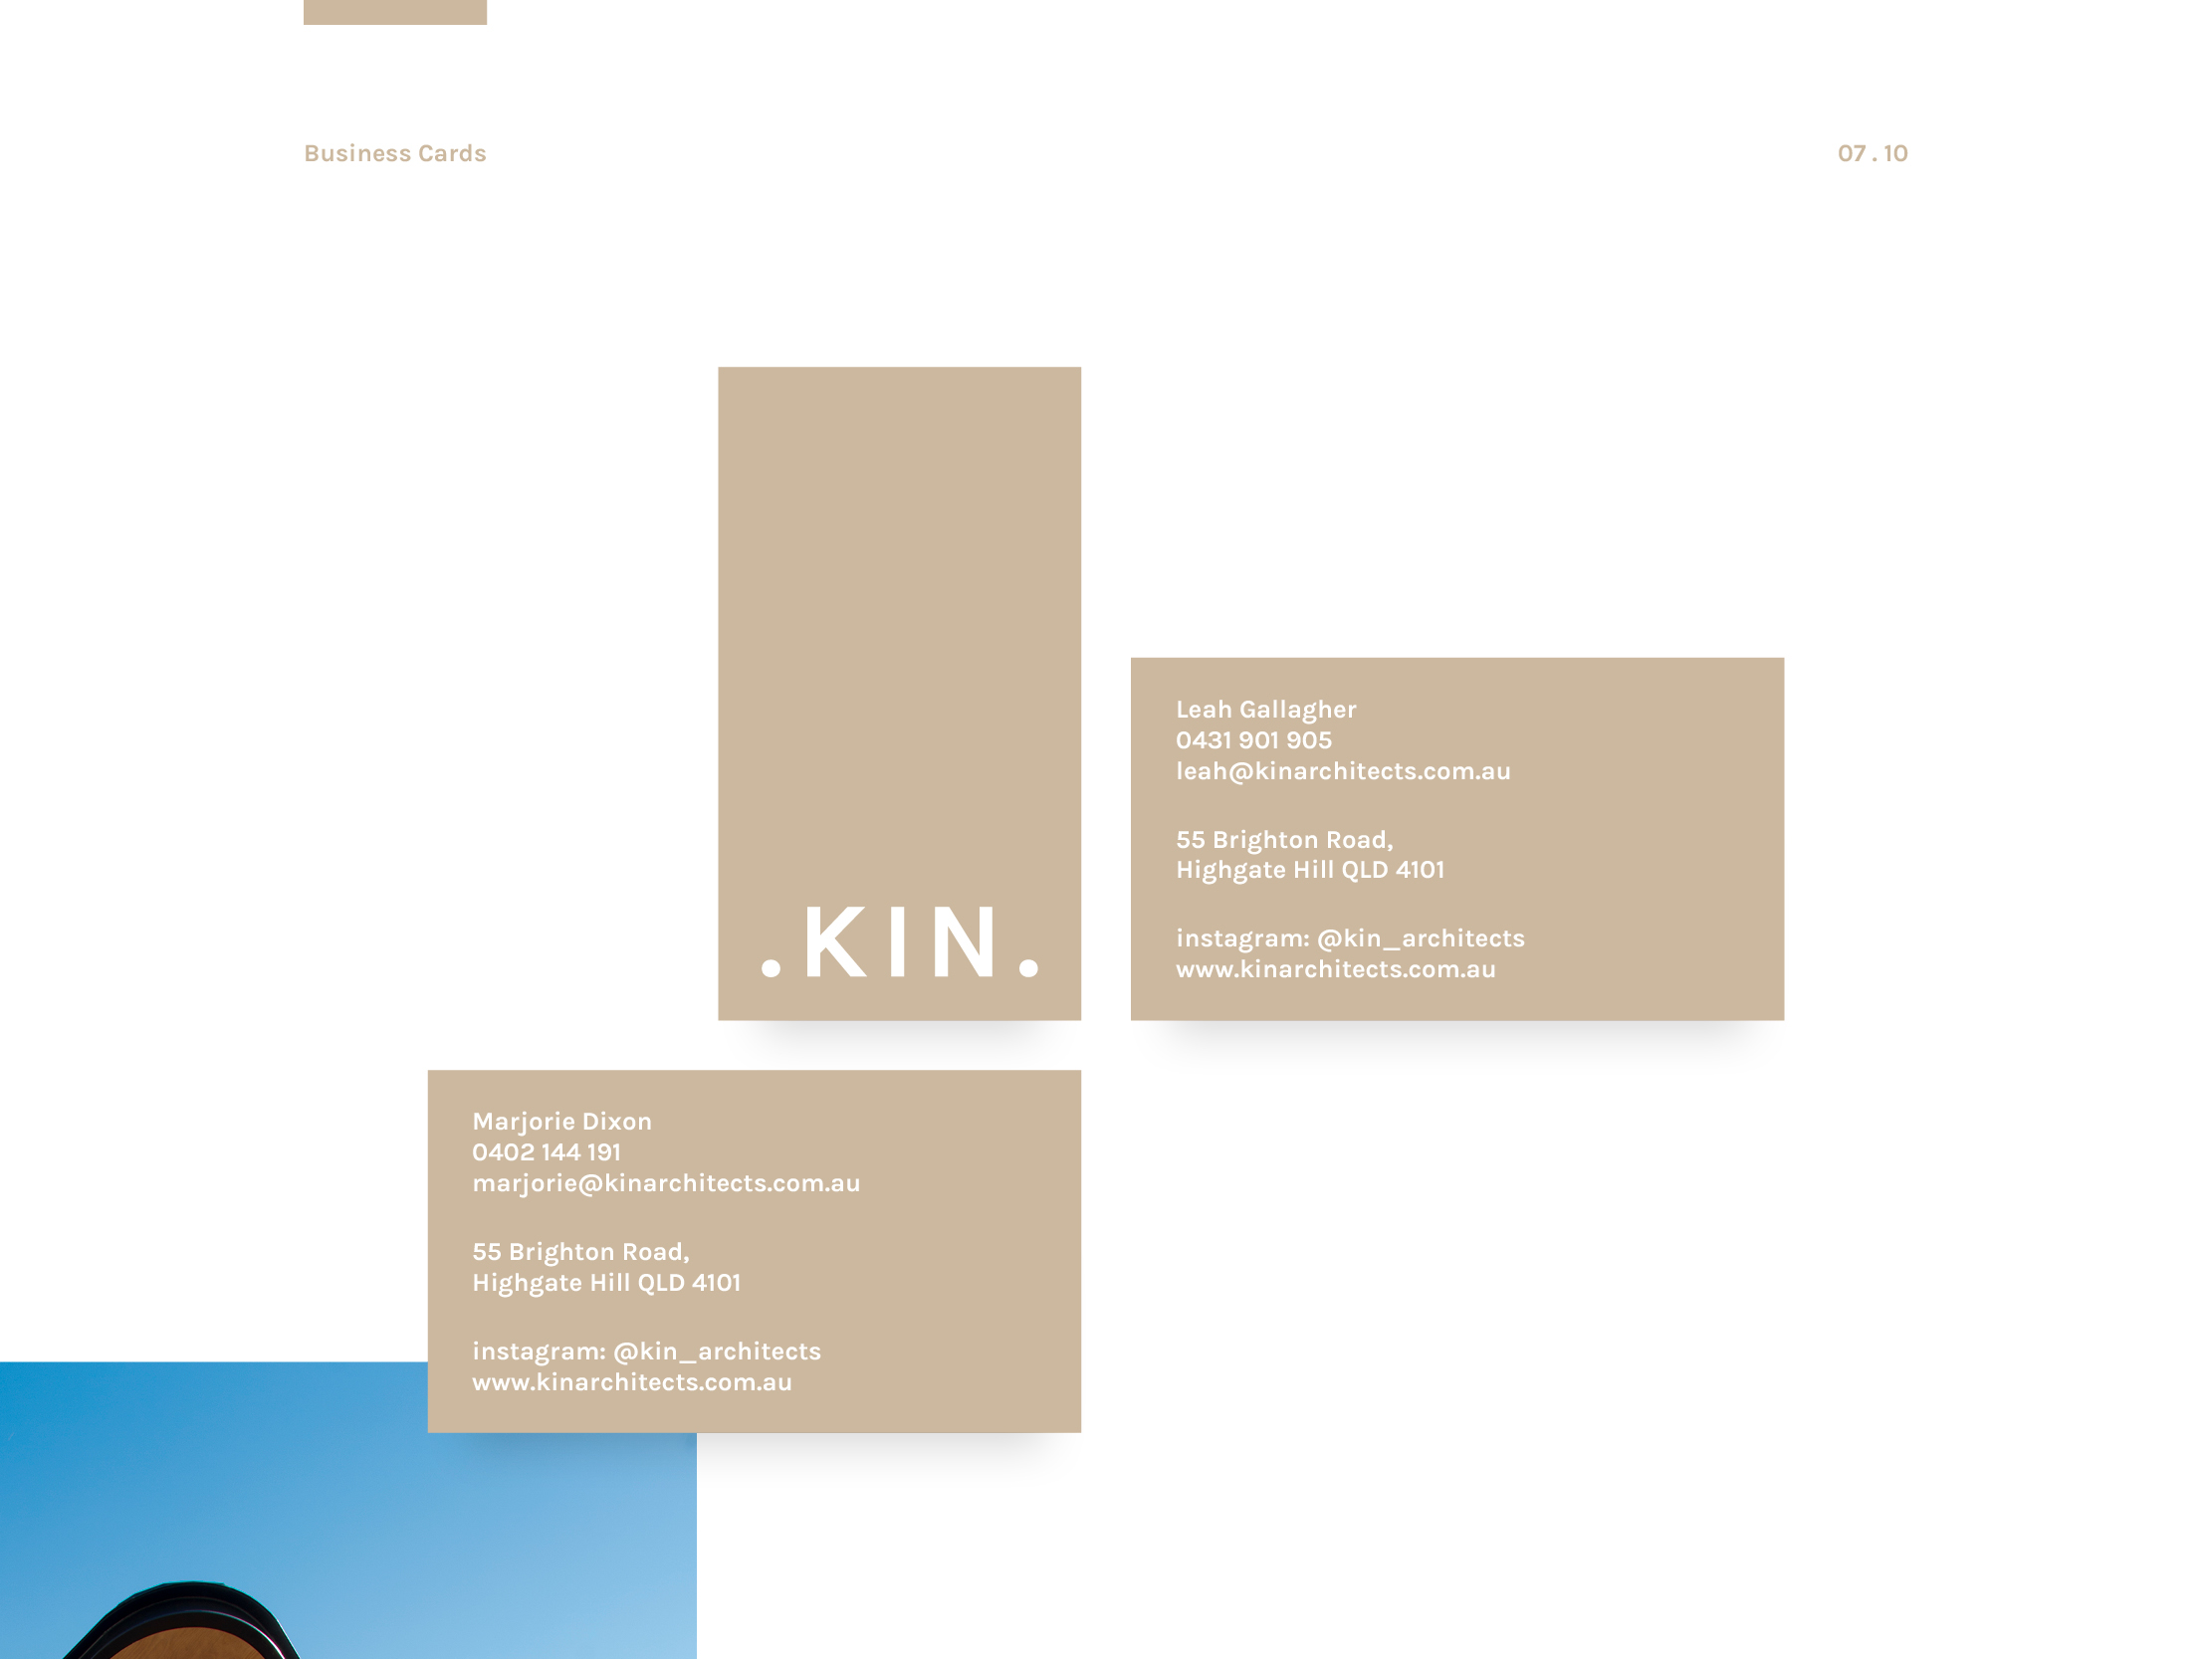 kinarchitects-project-web7.jpg